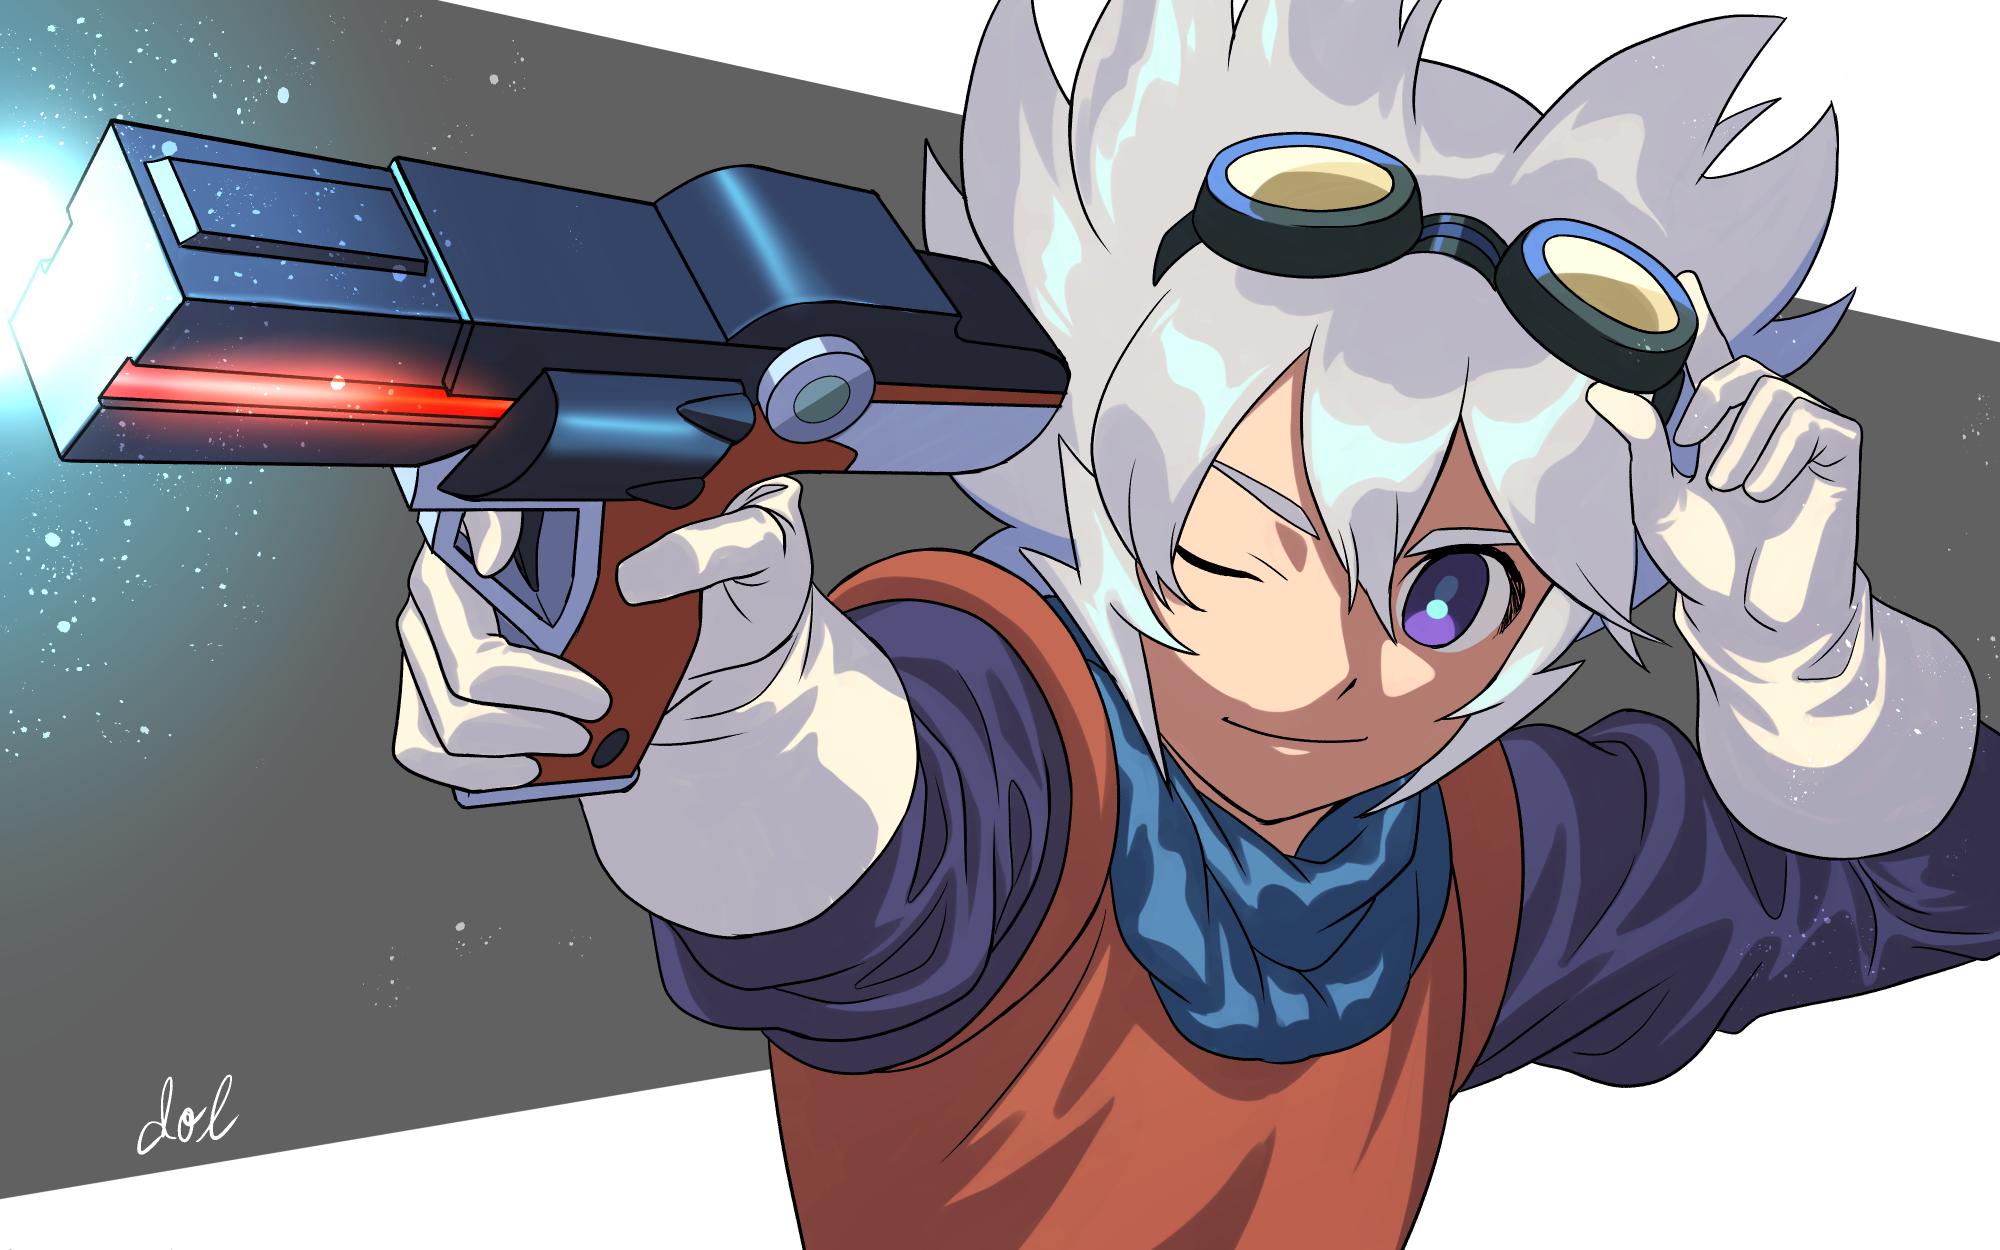 Pin by Joud on イナズマイレブン Friend anime, Anime, Boy art